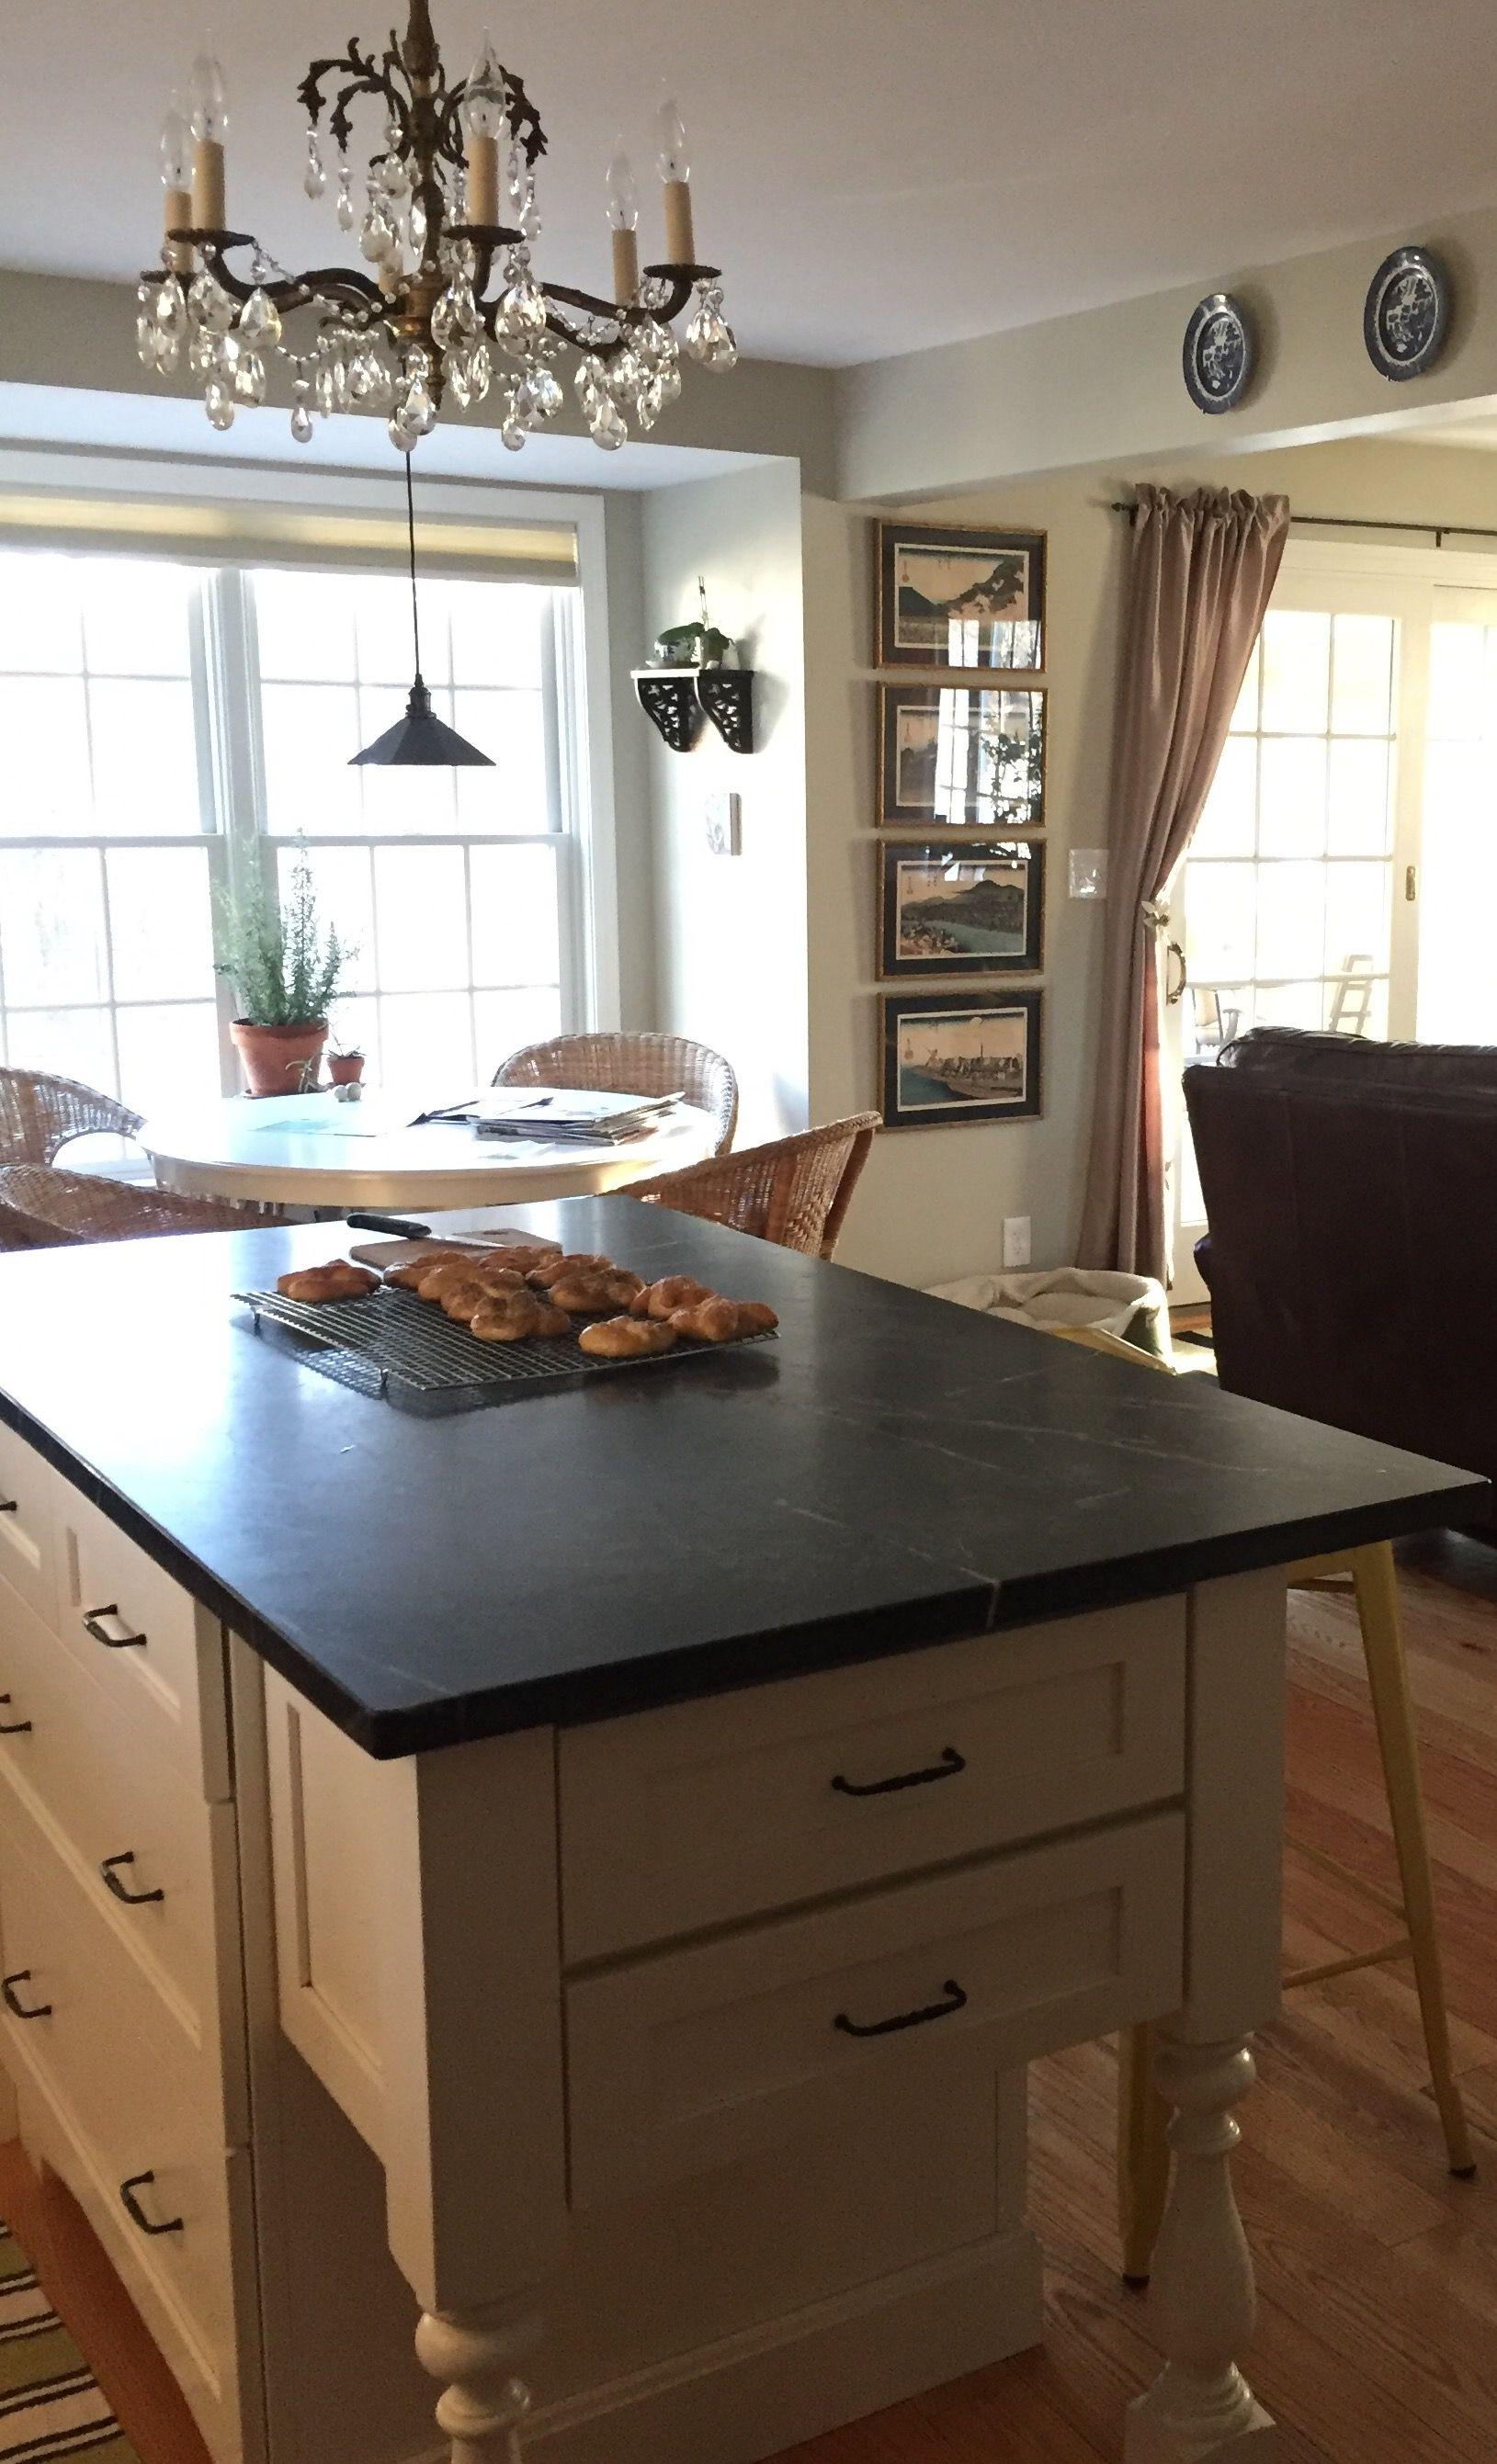 Kitchen soapstone benjamin moore hazy skies on walls benjamin moore simply white on trim durasupreme cabinets chandelier